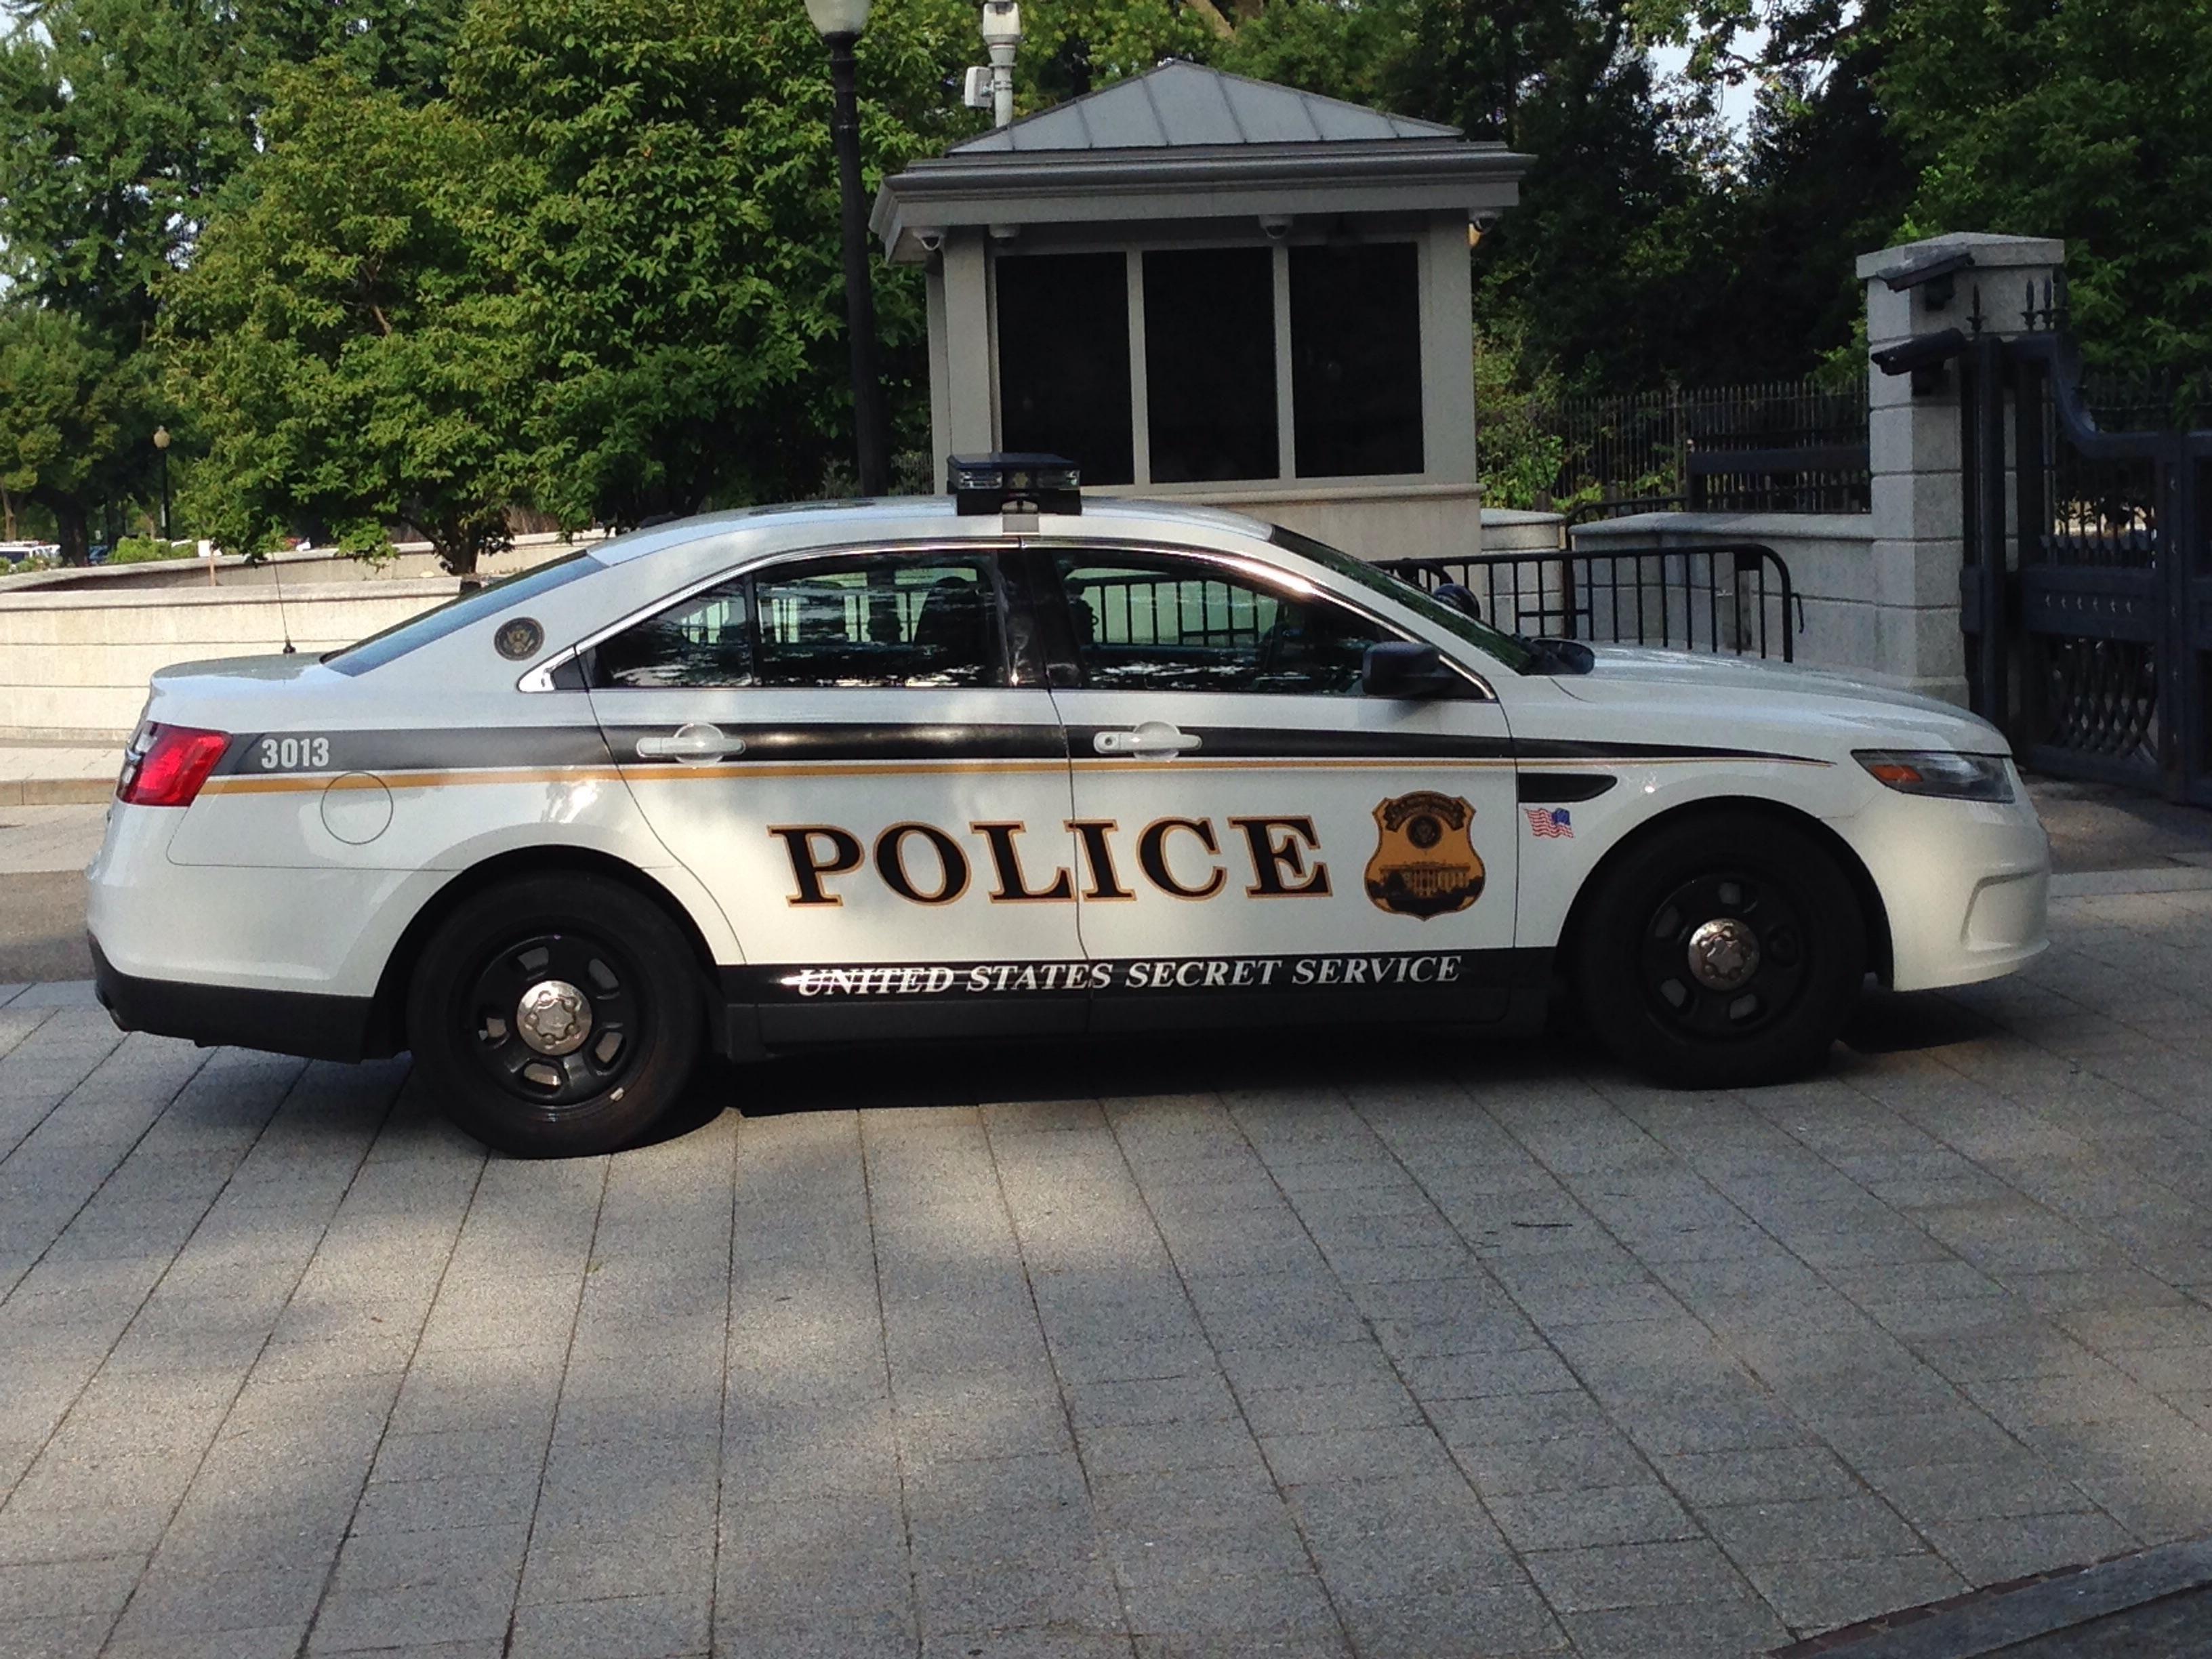 United States Secret Service Police Ford Police Interceptor Dc Ford Police Police Cars Us Police Car